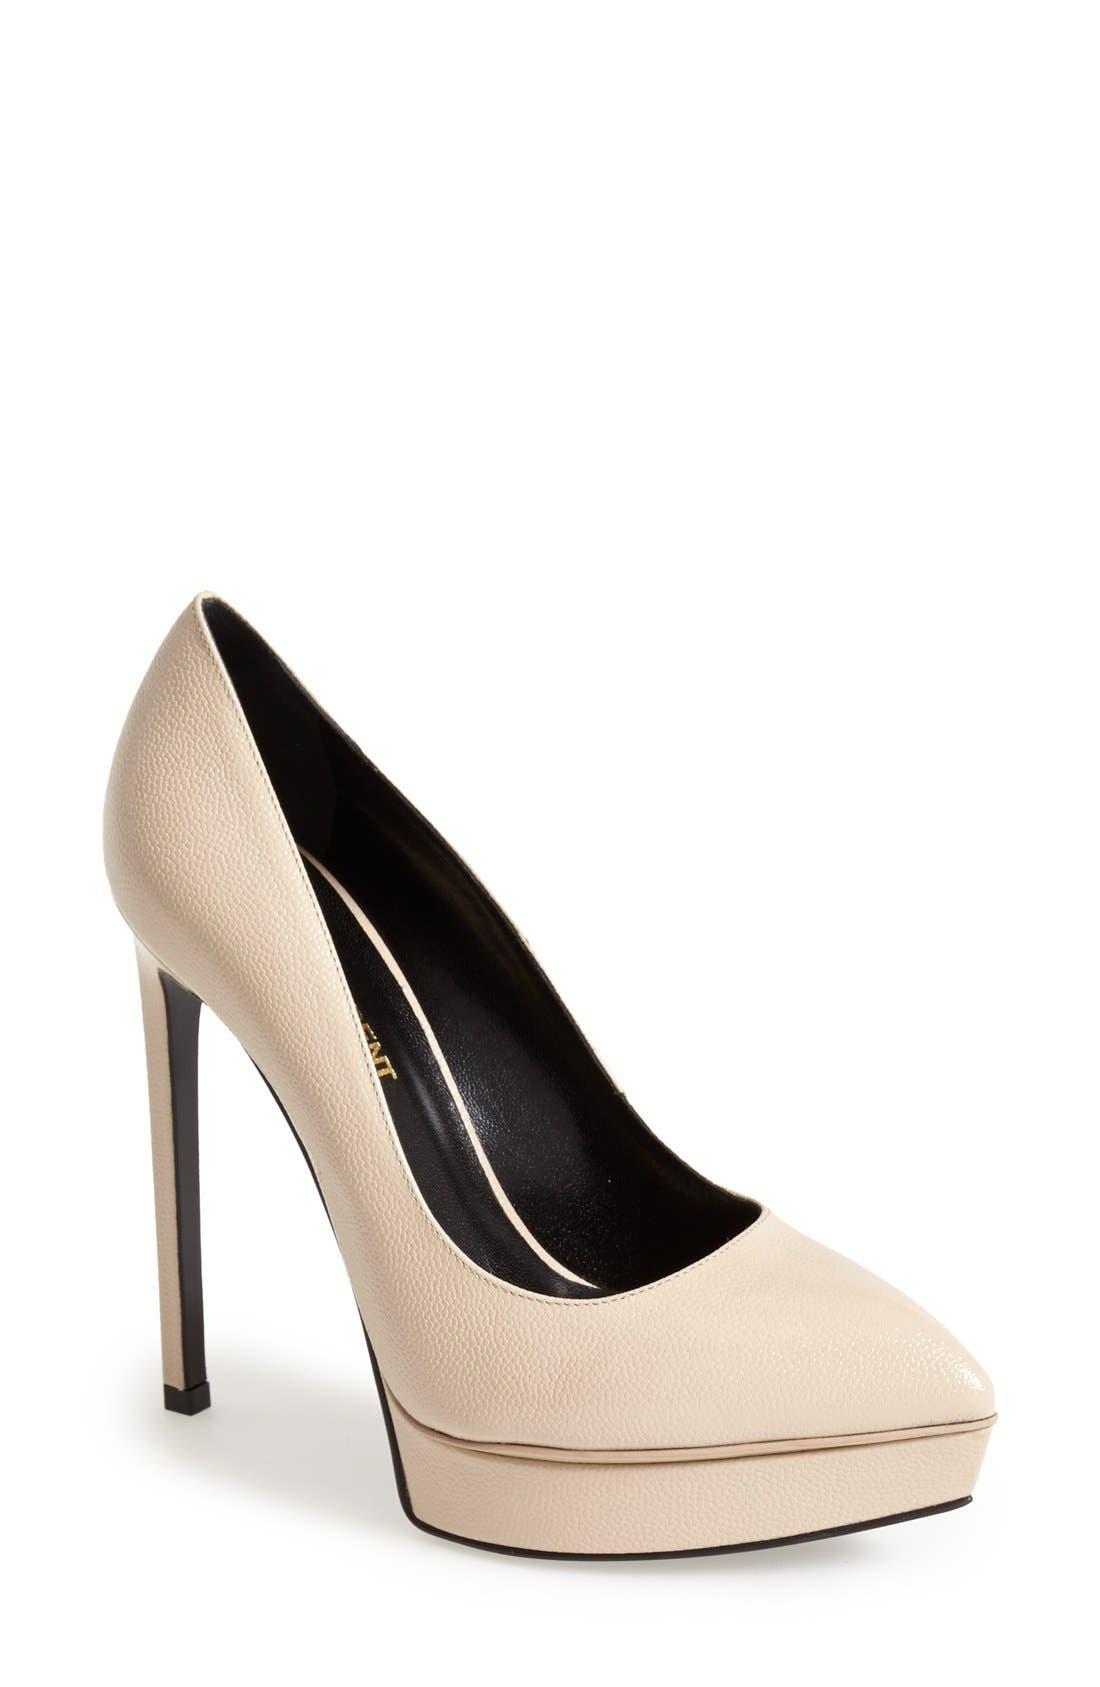 Main Image - Saint Laurent 'Janis' Pointy Toe Platform Pump (Women)